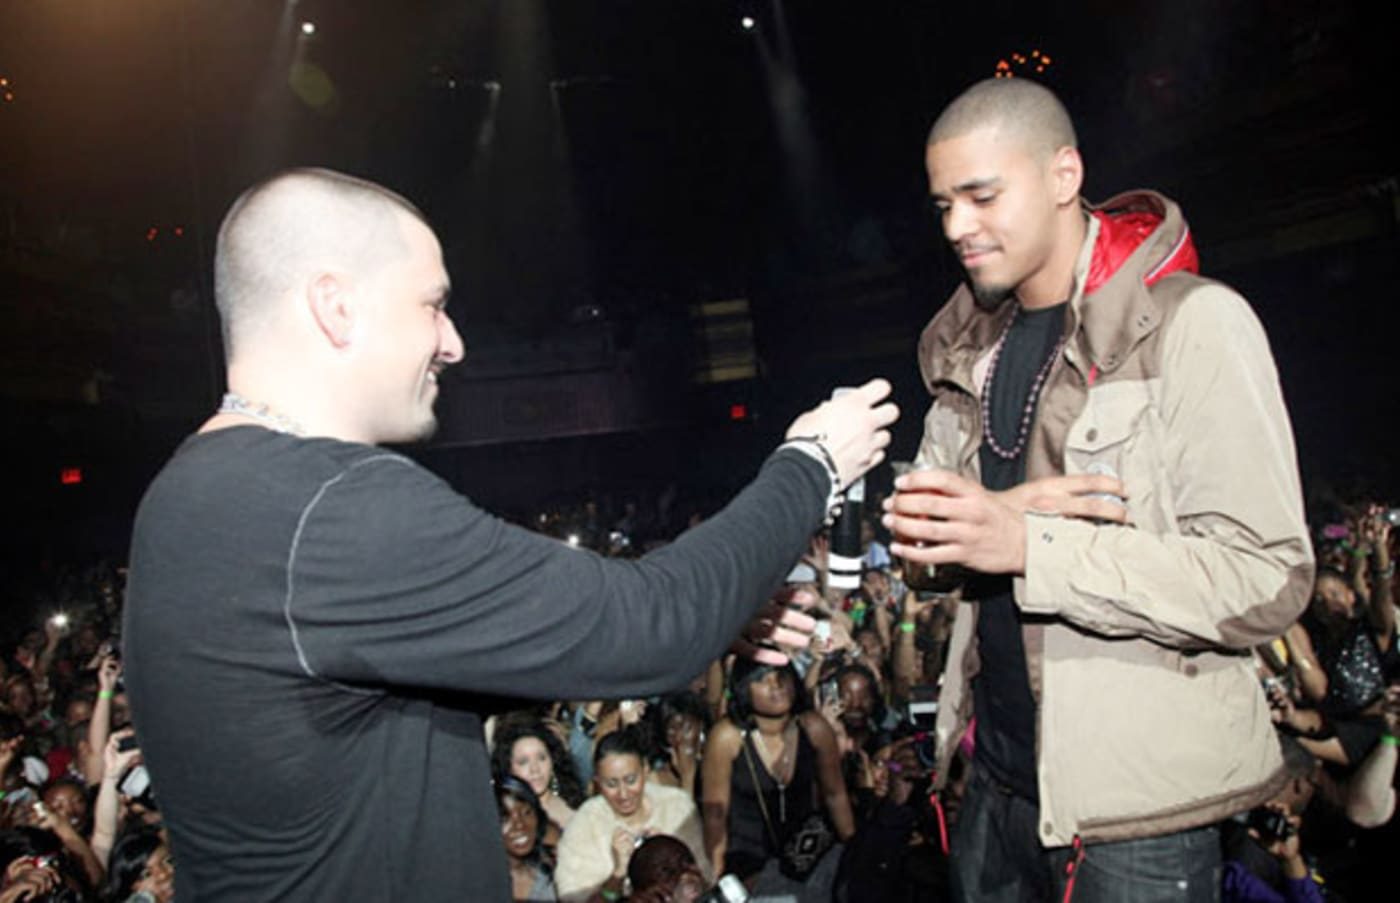 J Cole receiving a microphone